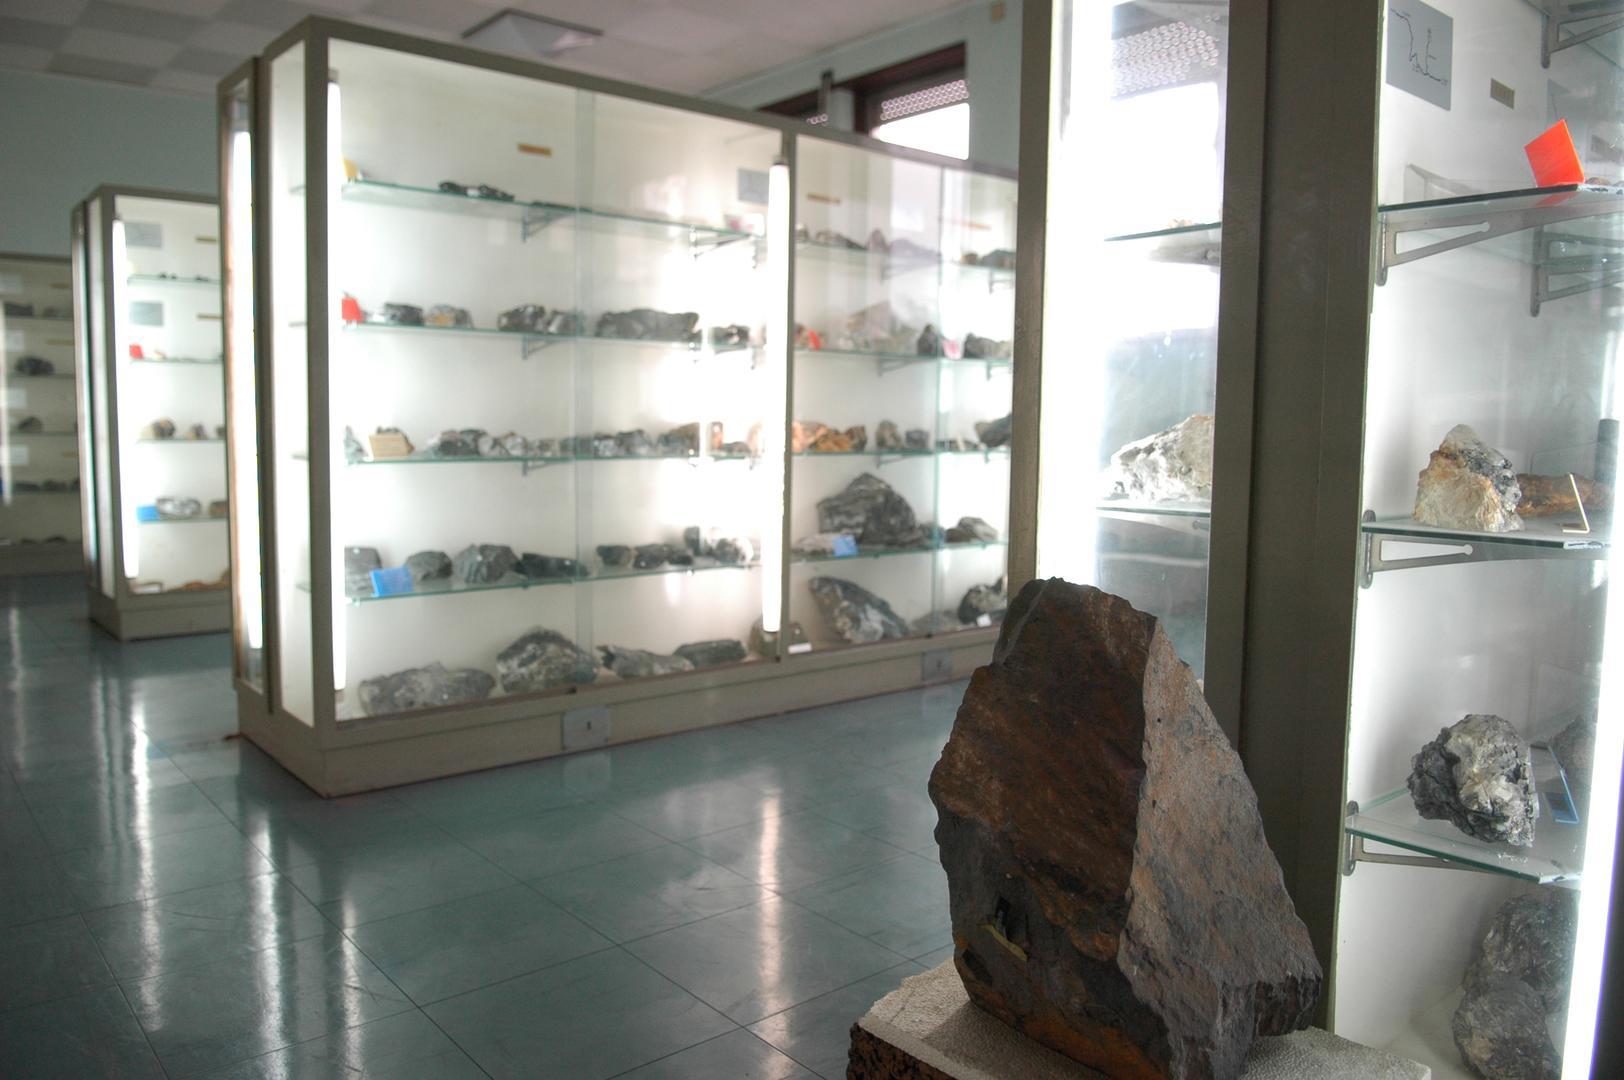 Museu de Jazigos Minerais Portugueses temporariamente encerrado